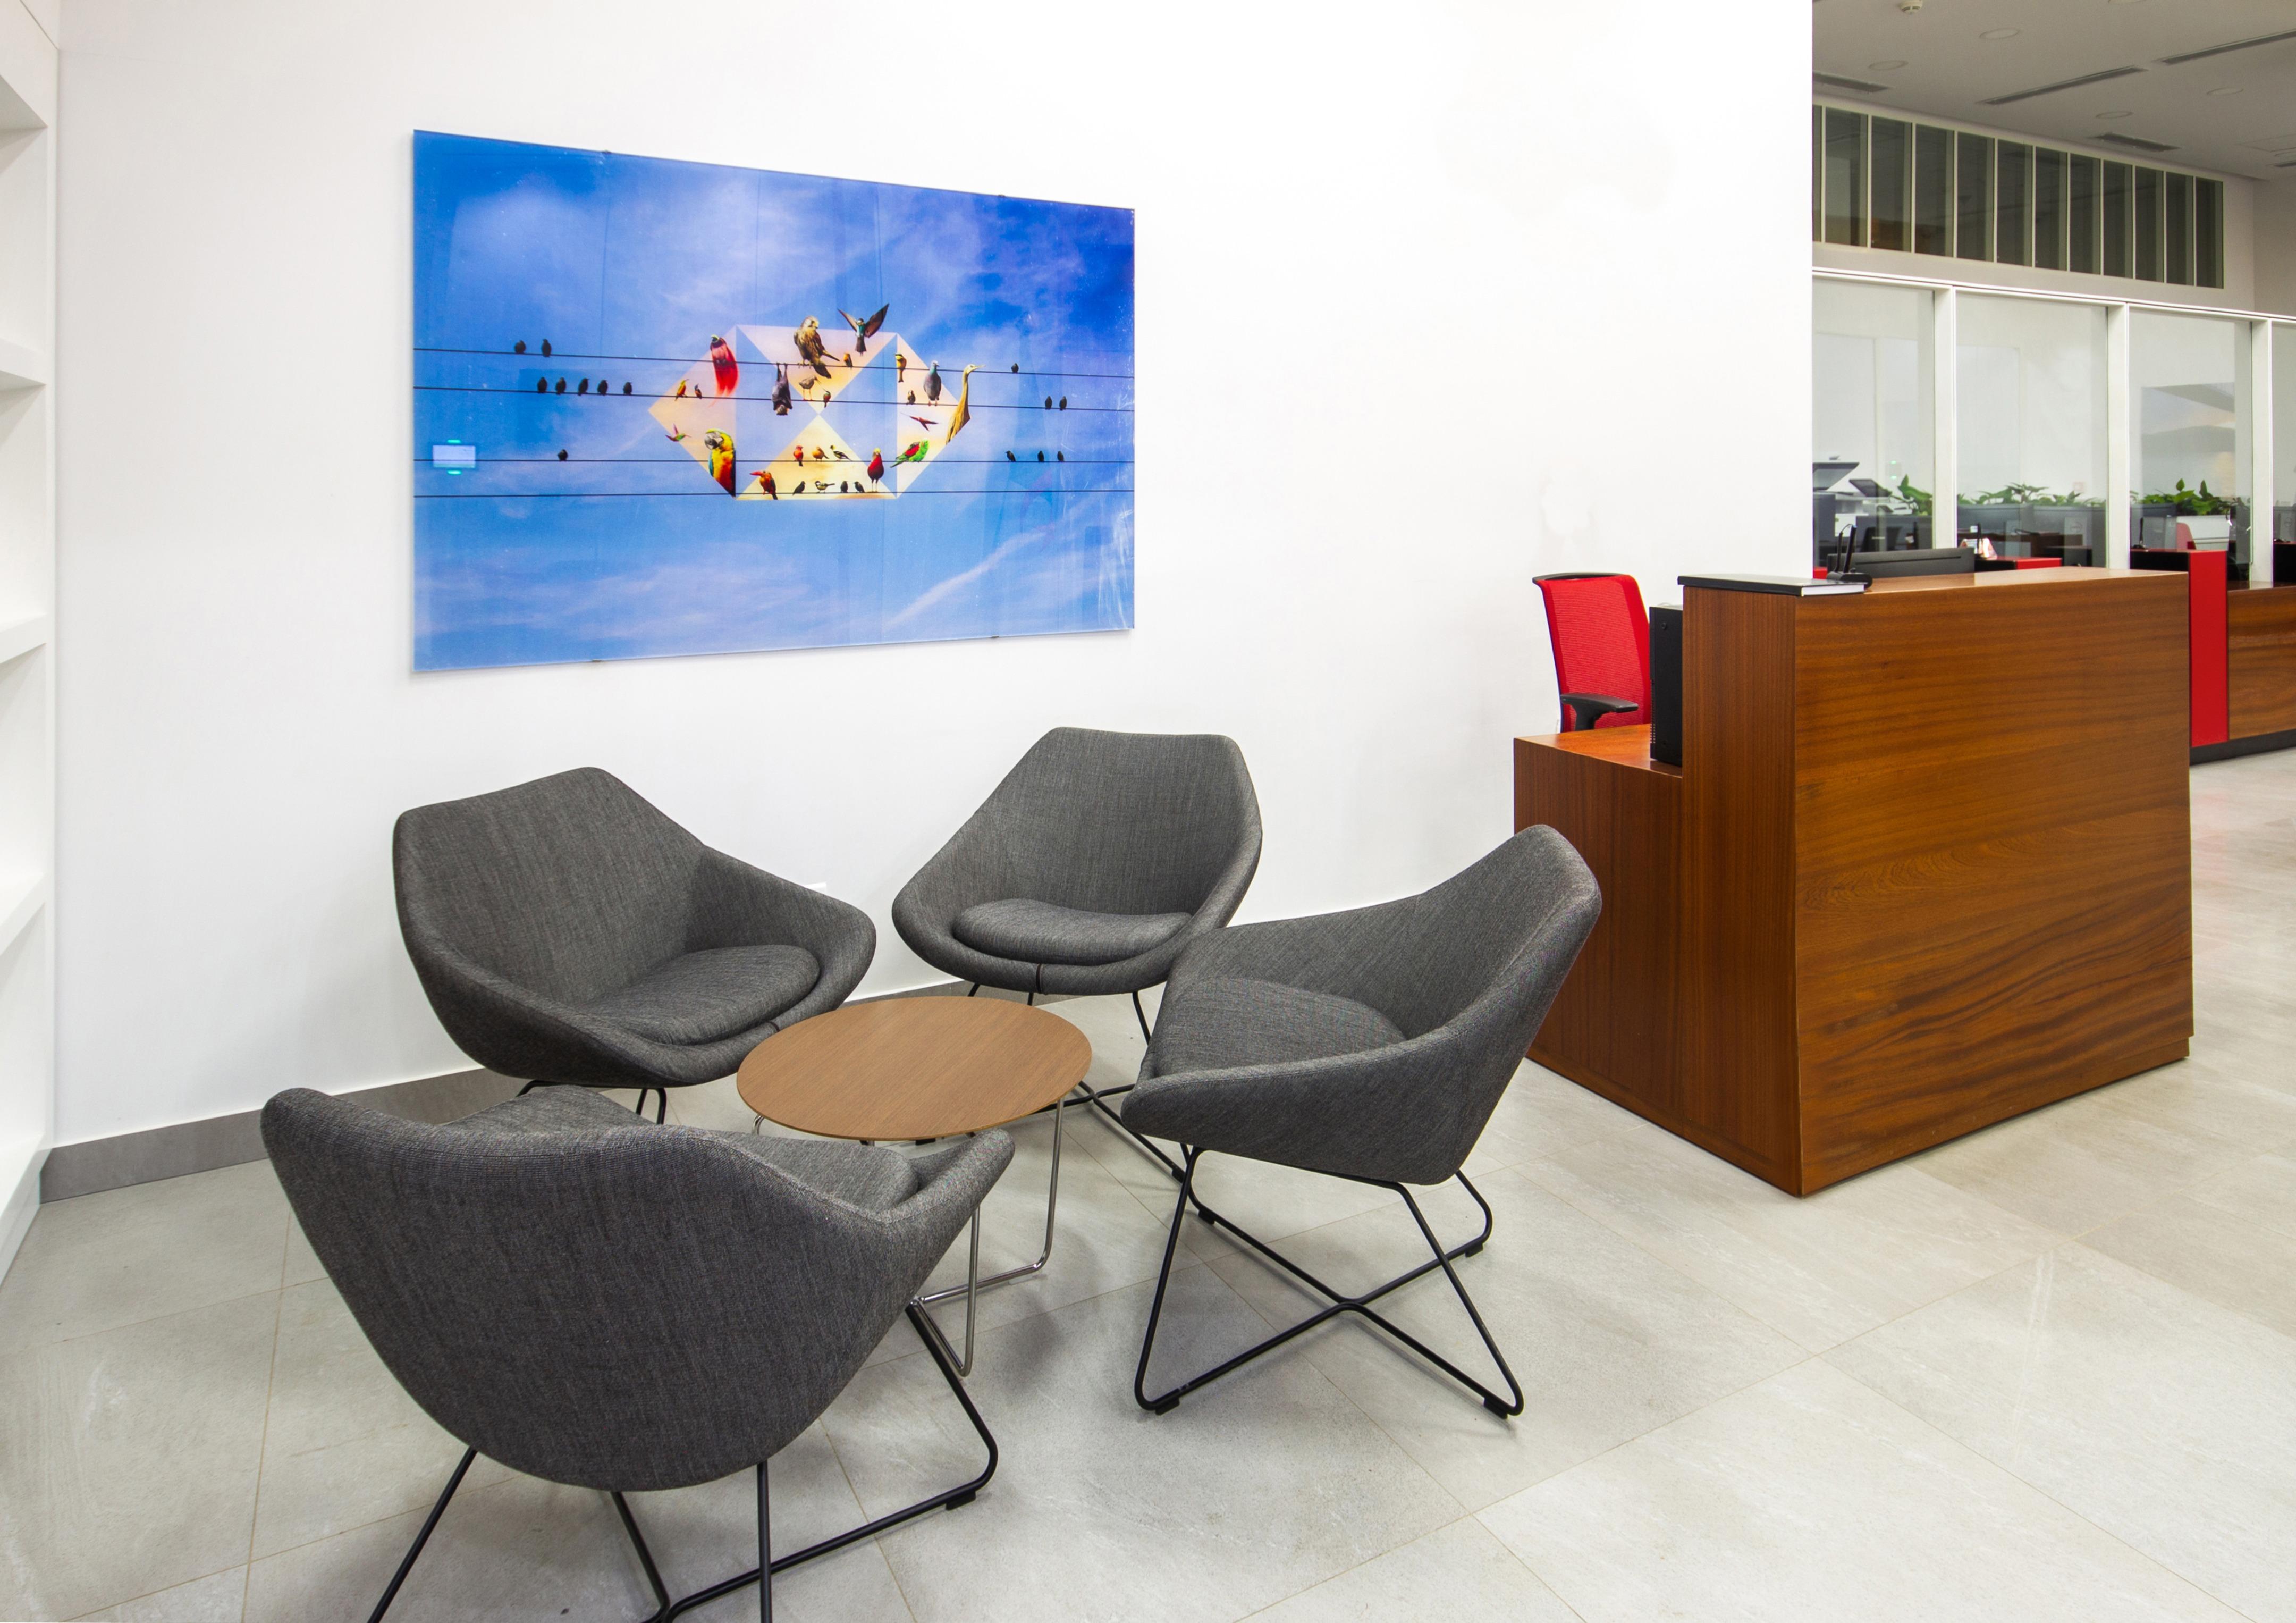 Design Furniture Bab Ezzouar hsbc headquarters in algiers   lounès messaoudi